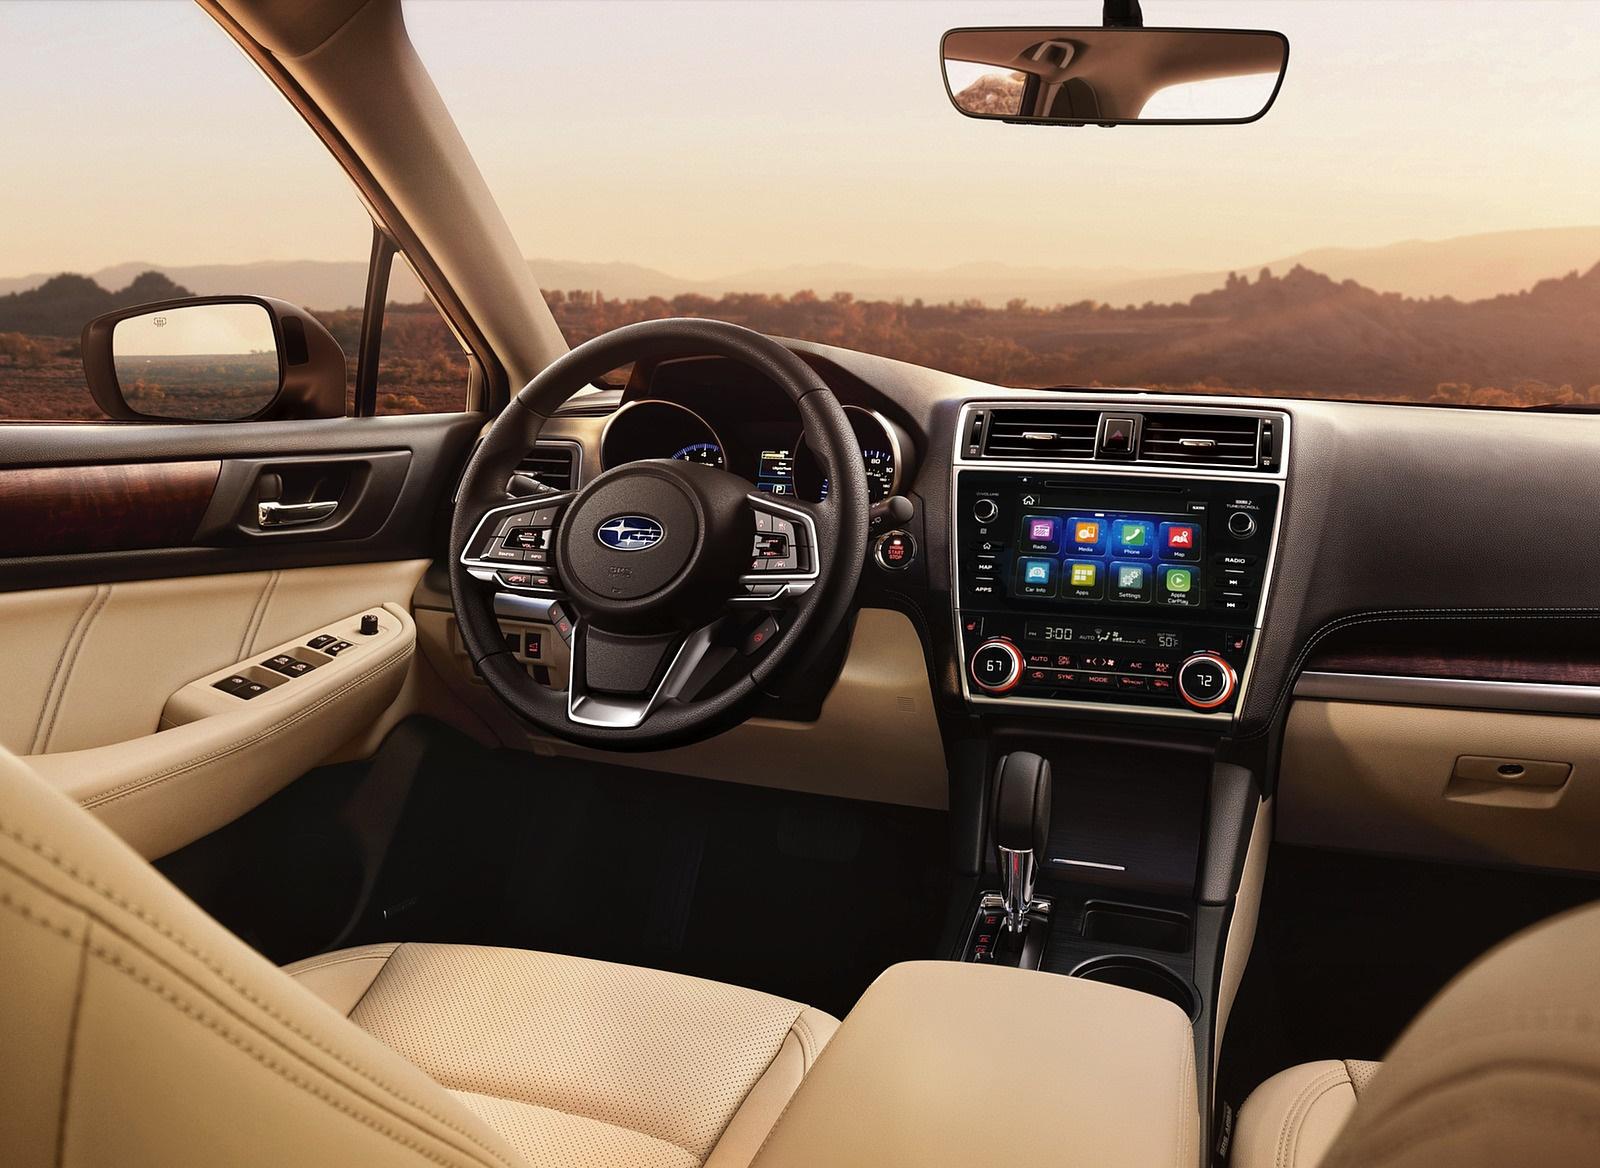 2018 Subaru Outback Interior Wallpaper (13)